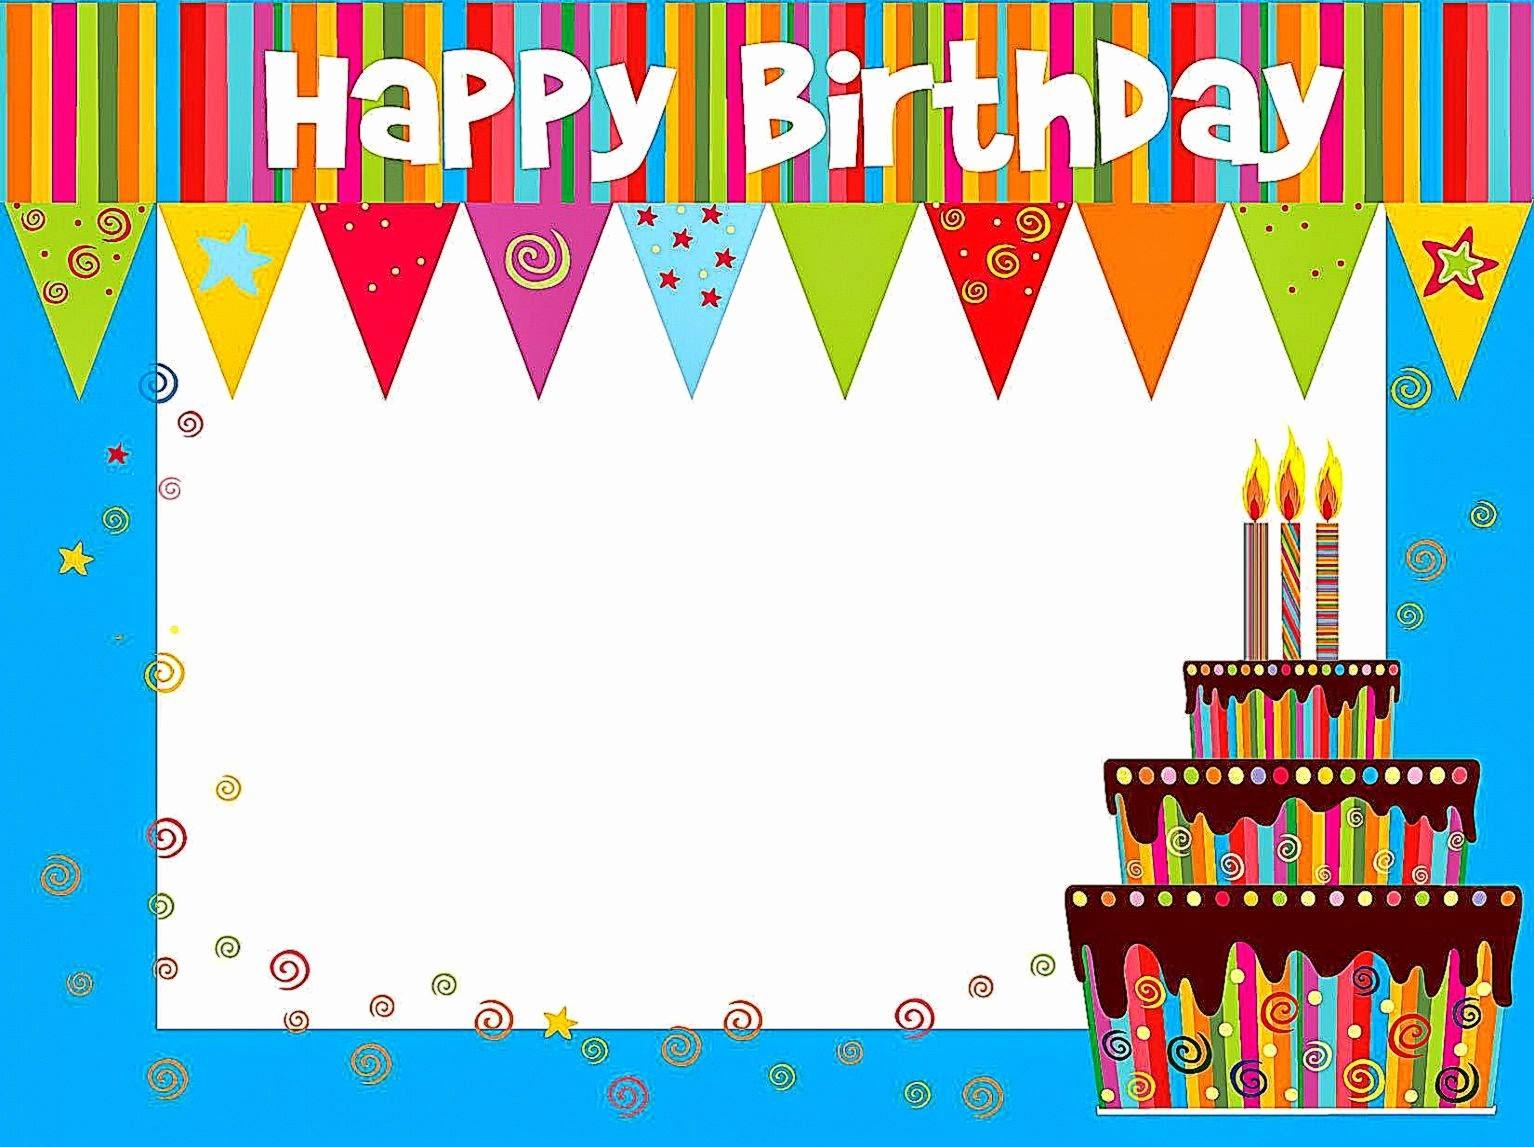 Happy Birthday Certificate Free Printable Luxury Birthday Card Borders – Best Happy Birthday Wishes